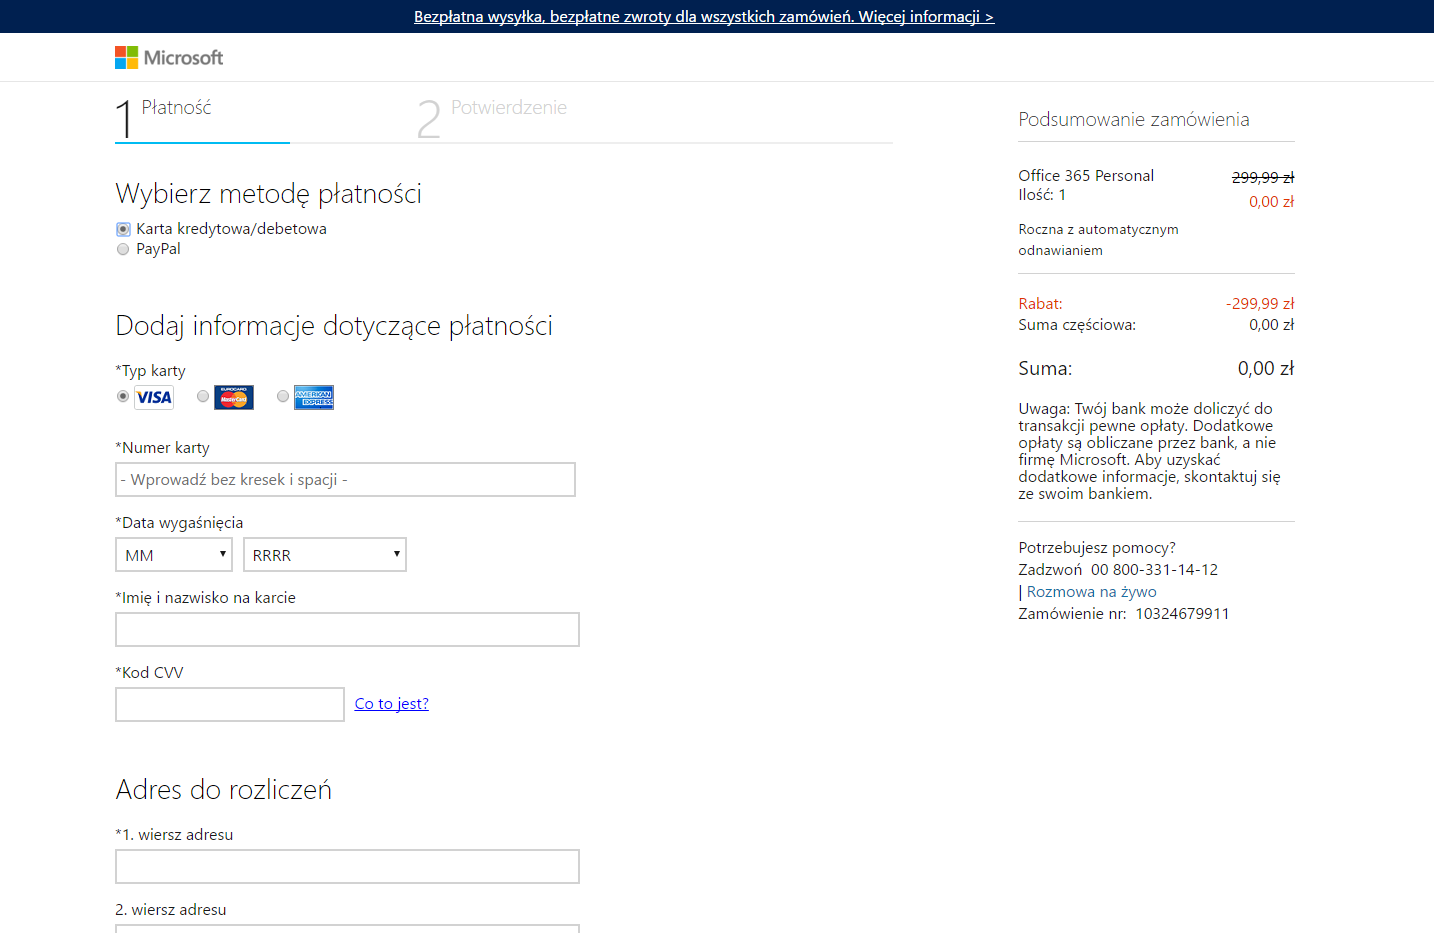 Office 365 Personal 1 Tb Na One Drive Za Darmo Na Rok